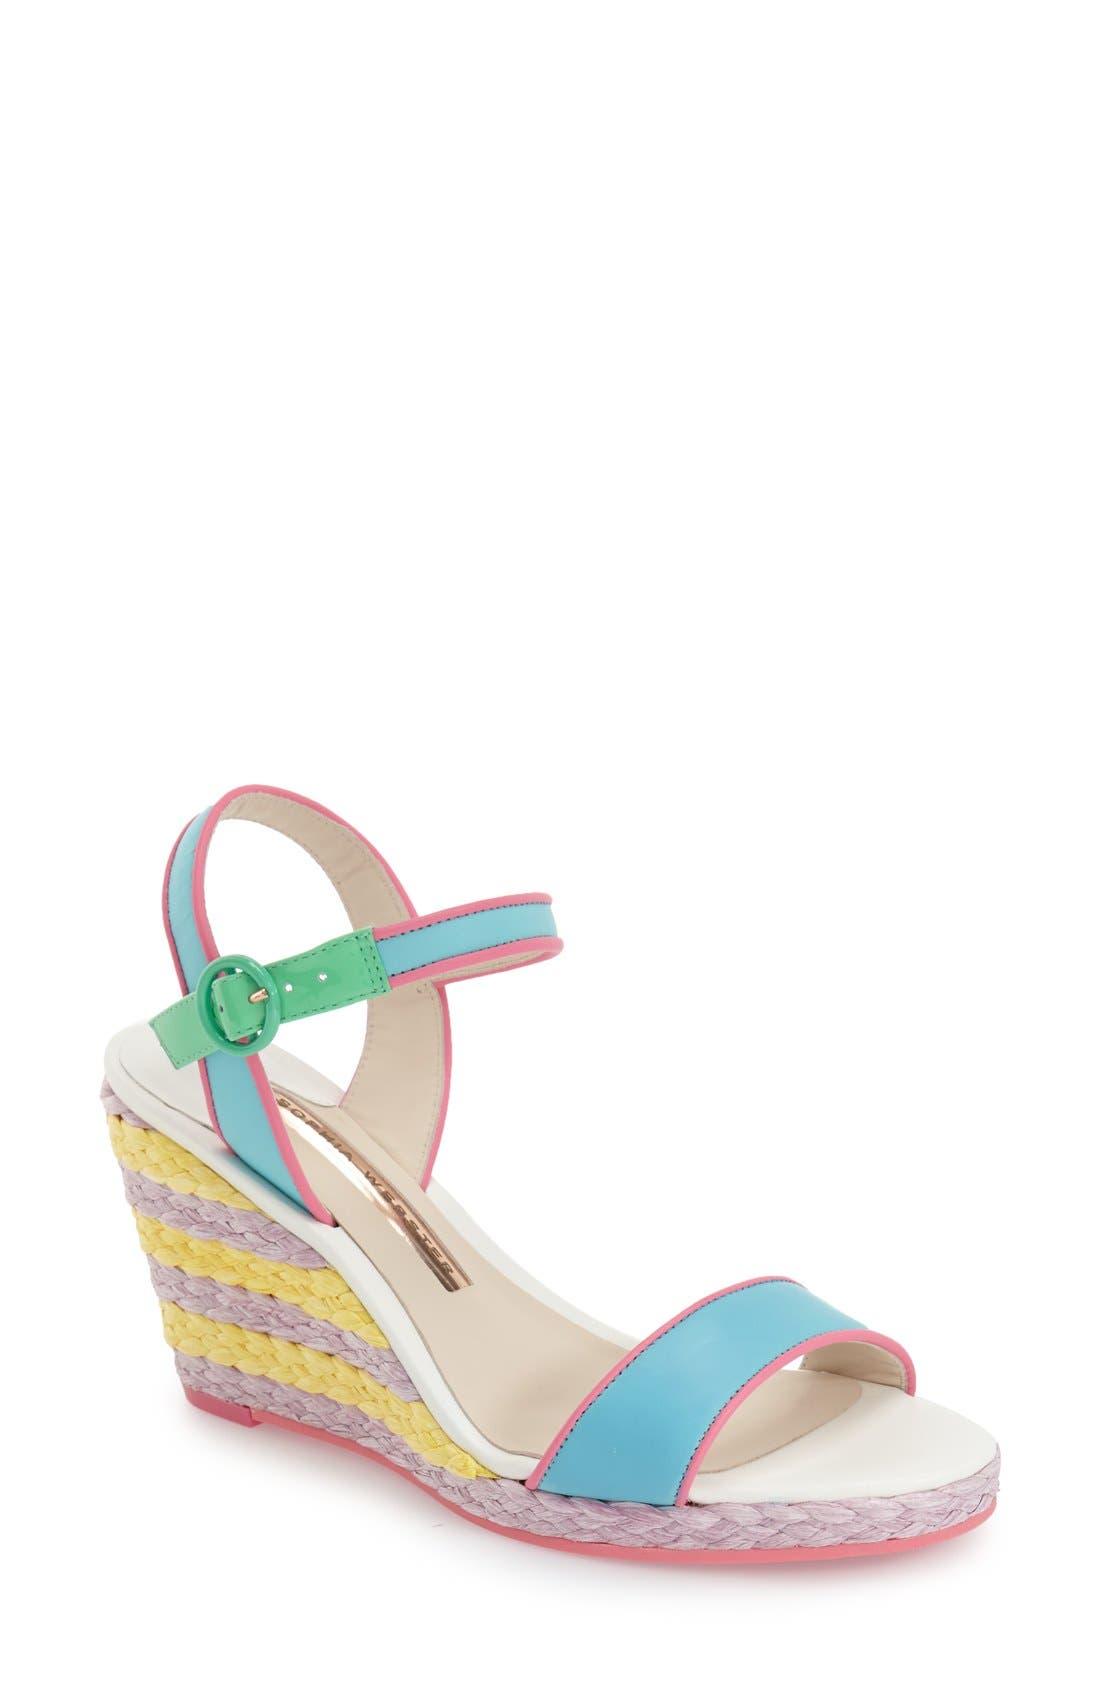 Main Image - Sophia Webster 'Lucita' Wedge Sandal (Women)